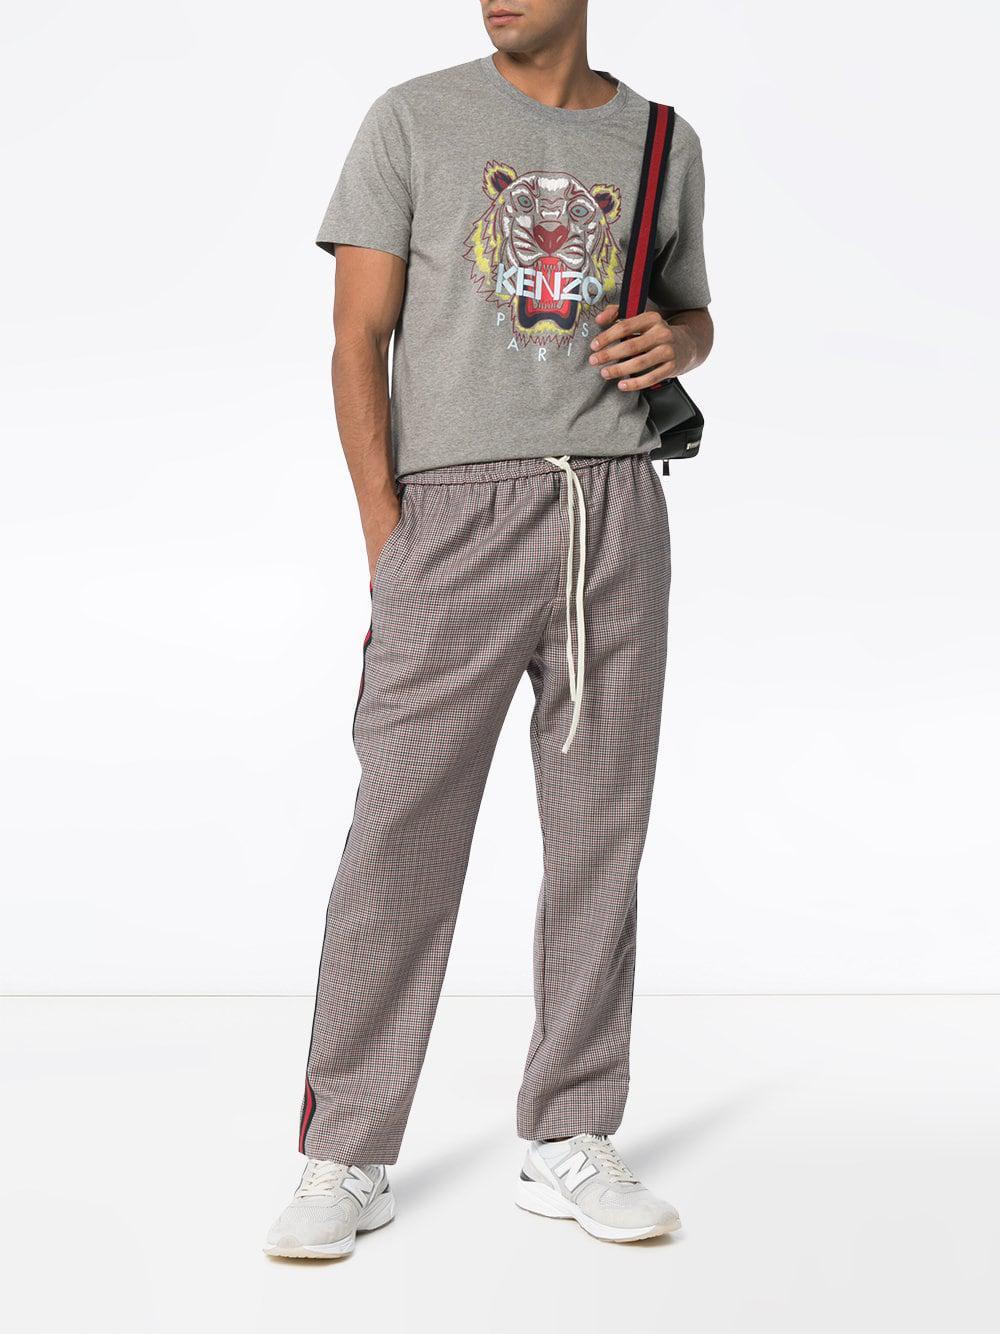 1c8d17684 KENZO Tiger Print T-shirt in Gray for Men - Lyst